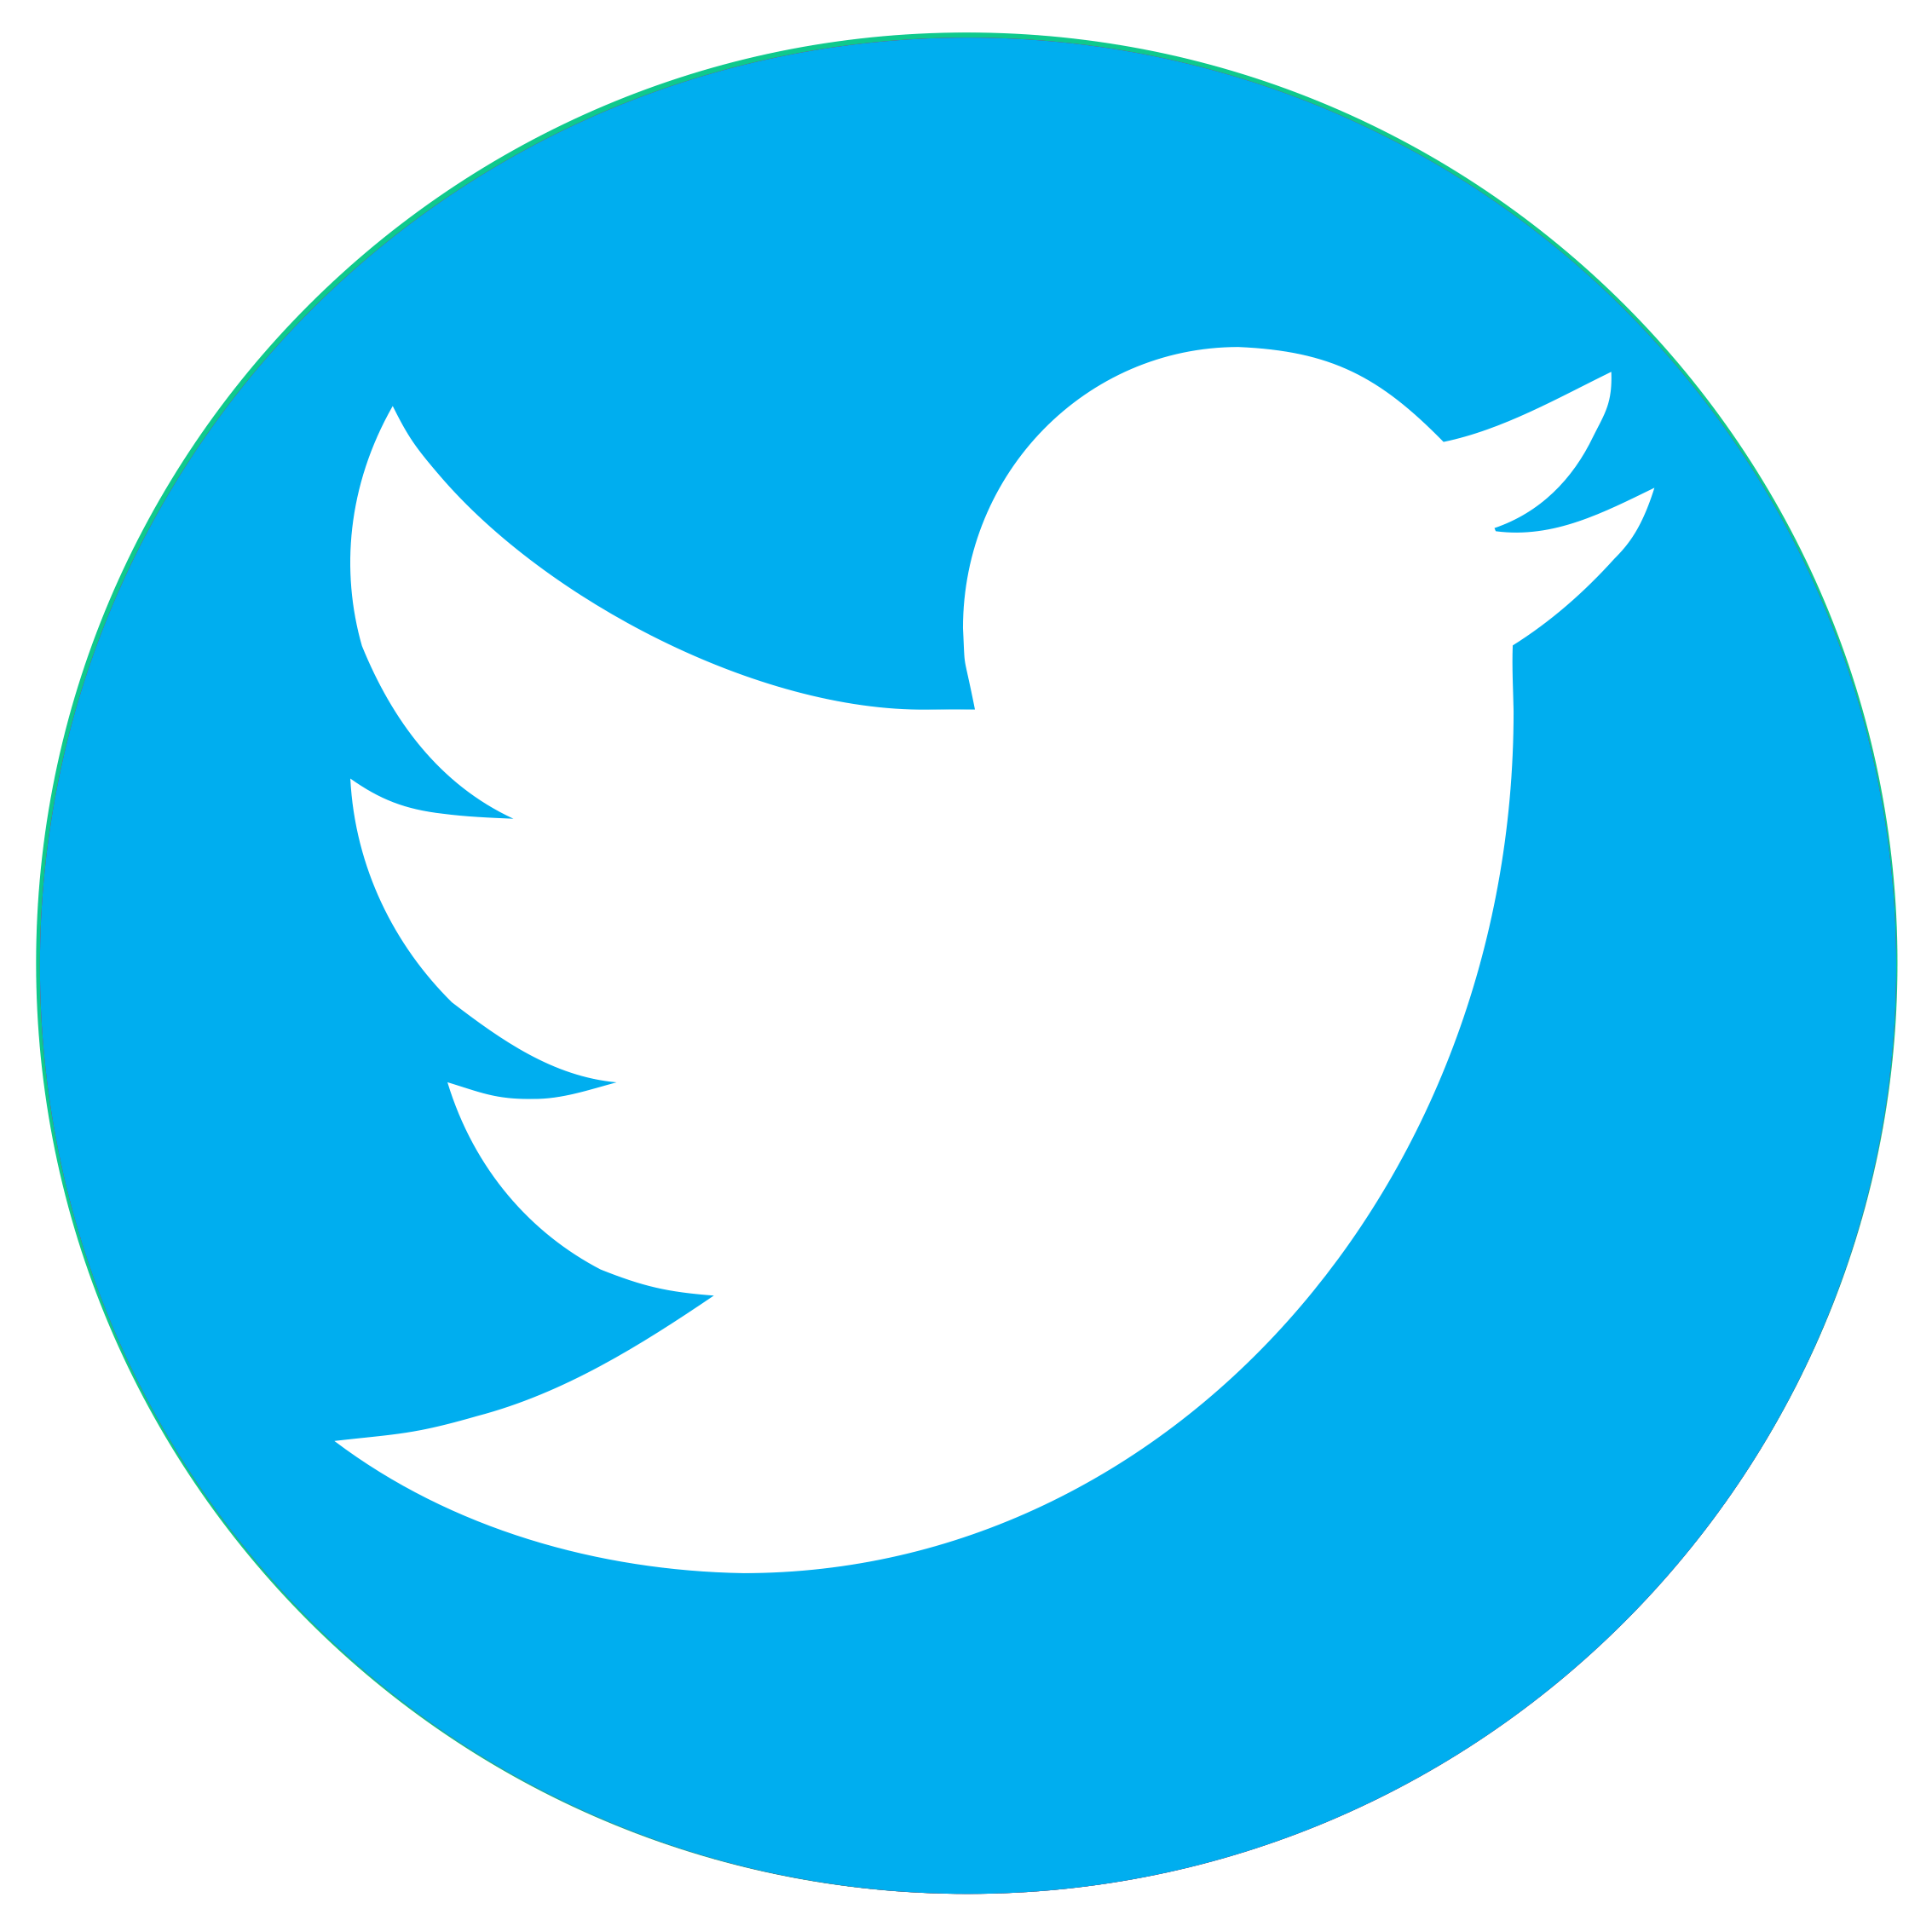 logo rond twitter